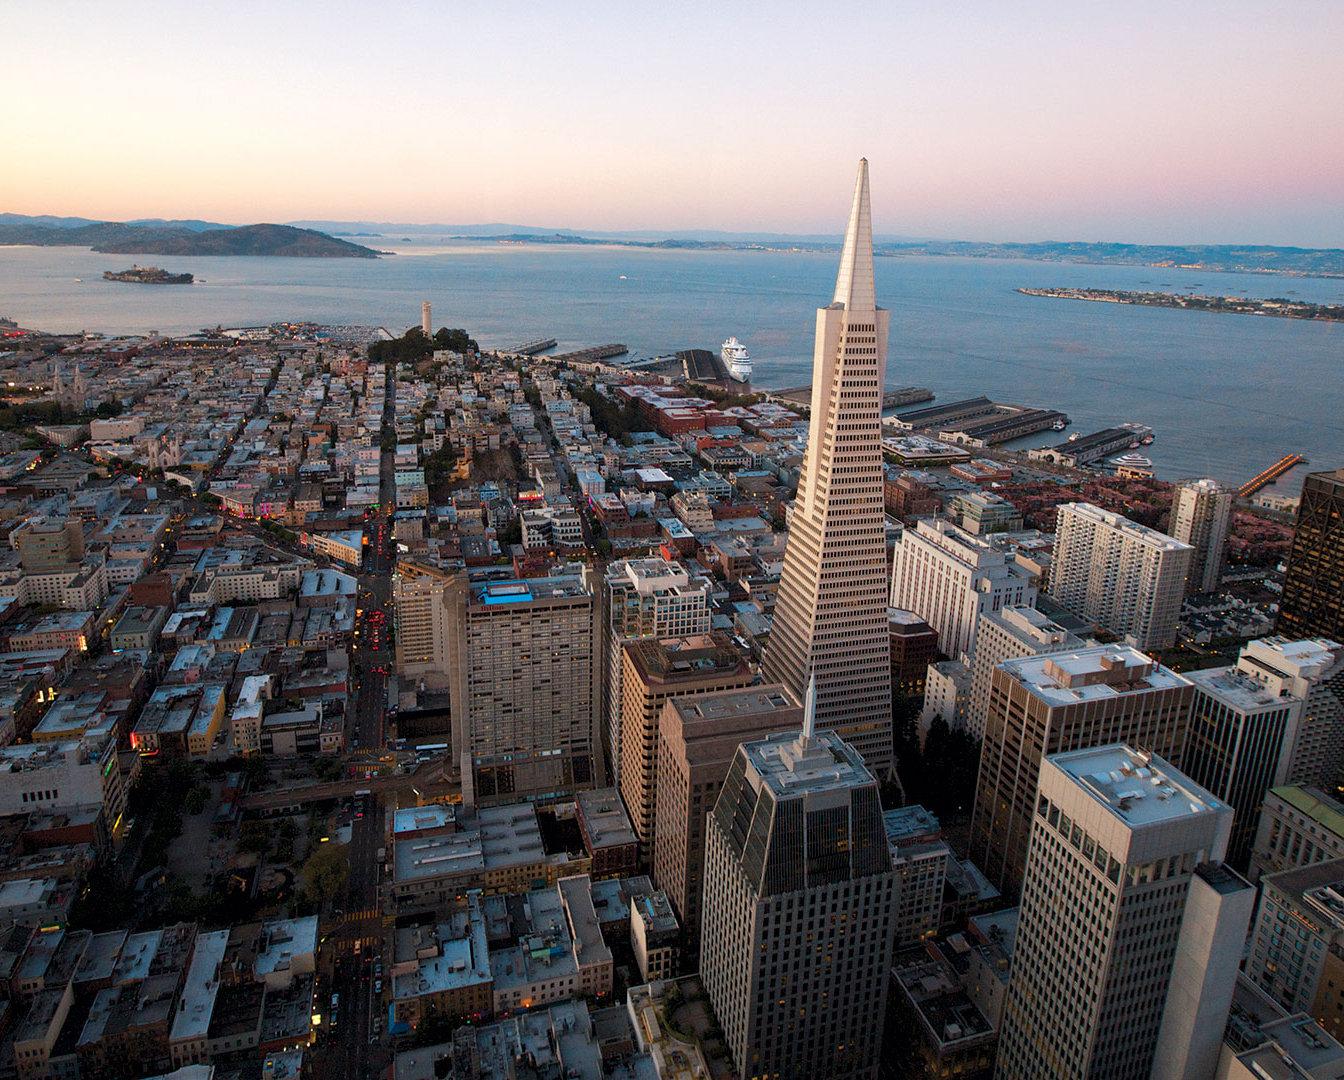 Image of San Francisco